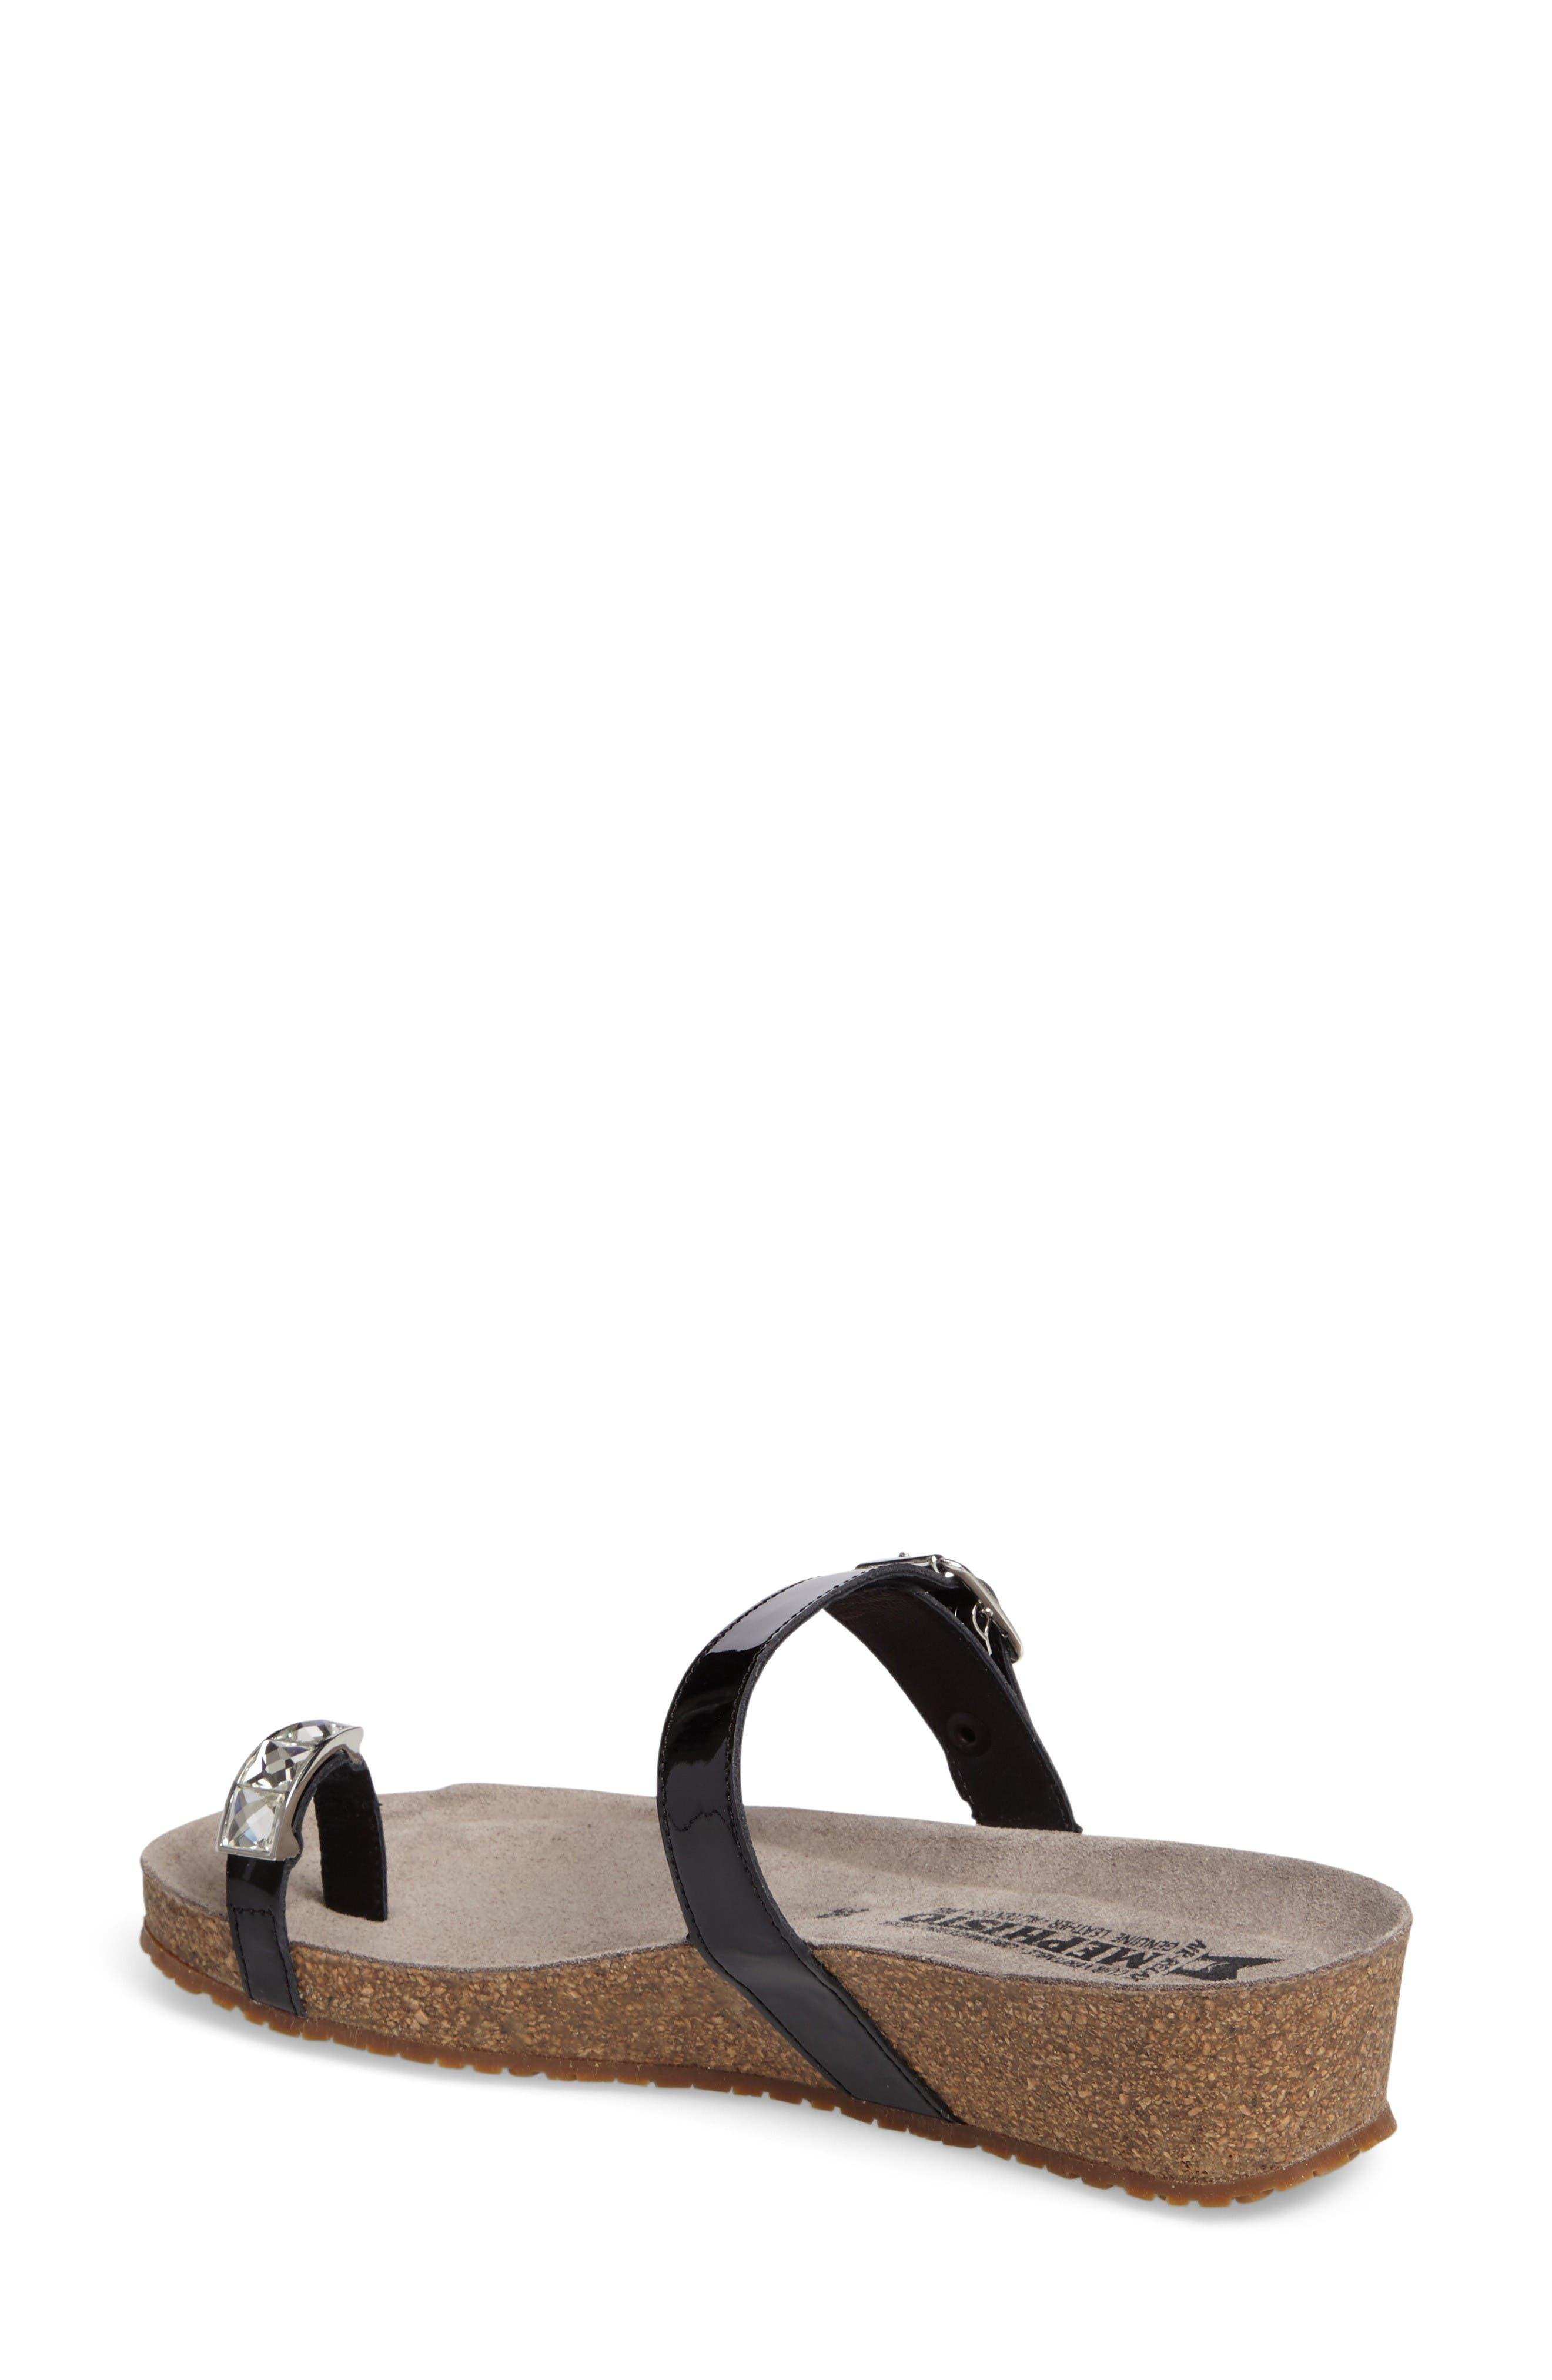 Ilaria Embellished Wedge Sandal,                             Alternate thumbnail 2, color,                             Black Patent Leather